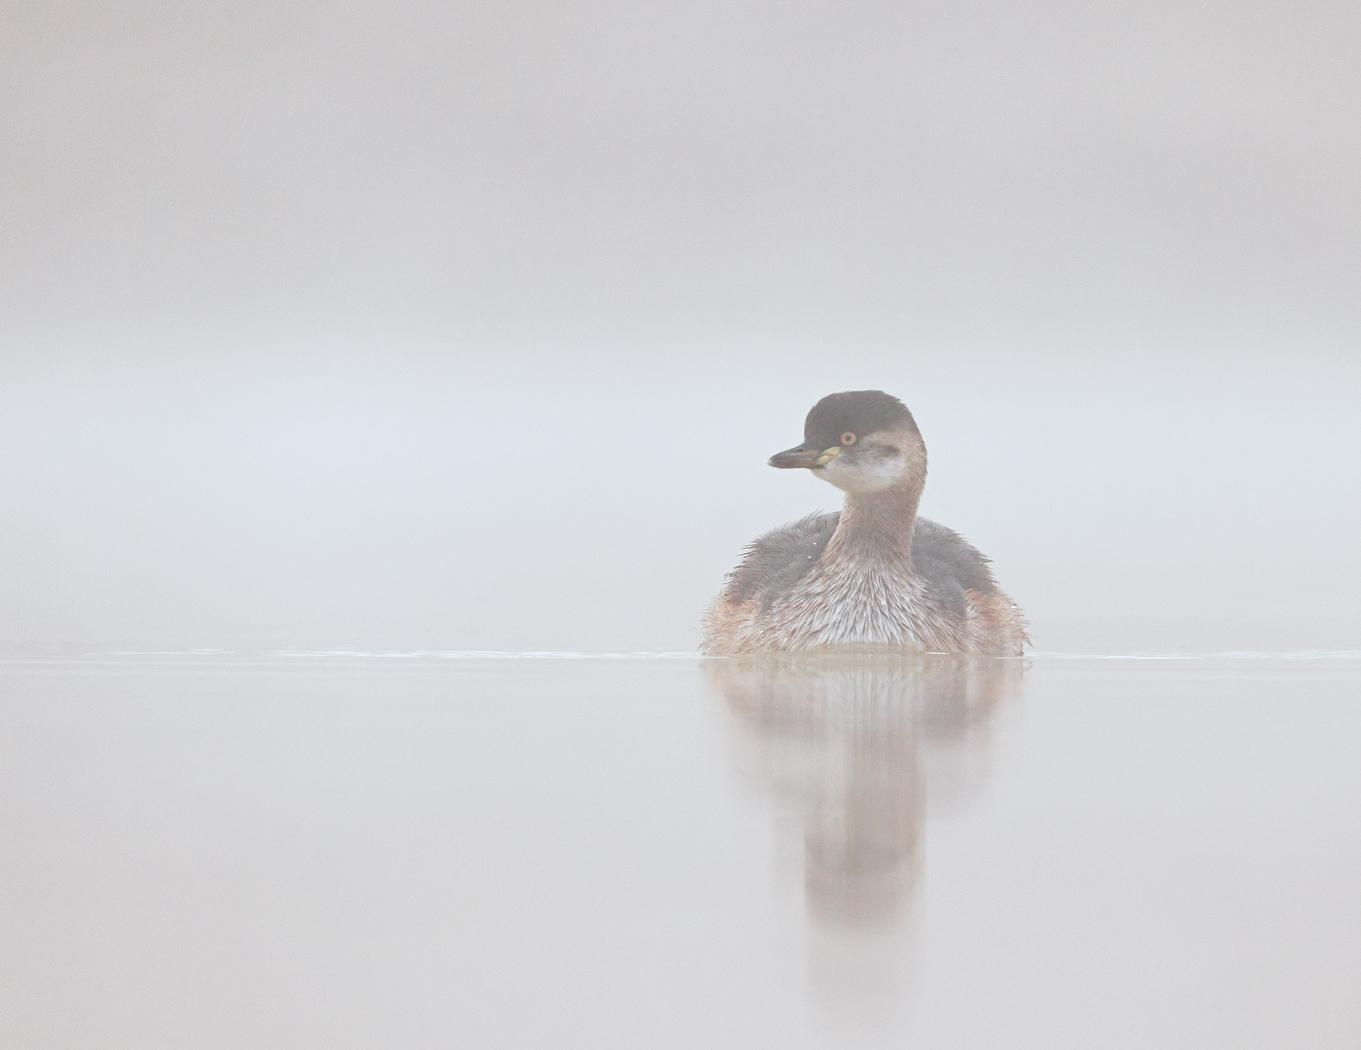 Australasian Grebe (Image ID 35886)